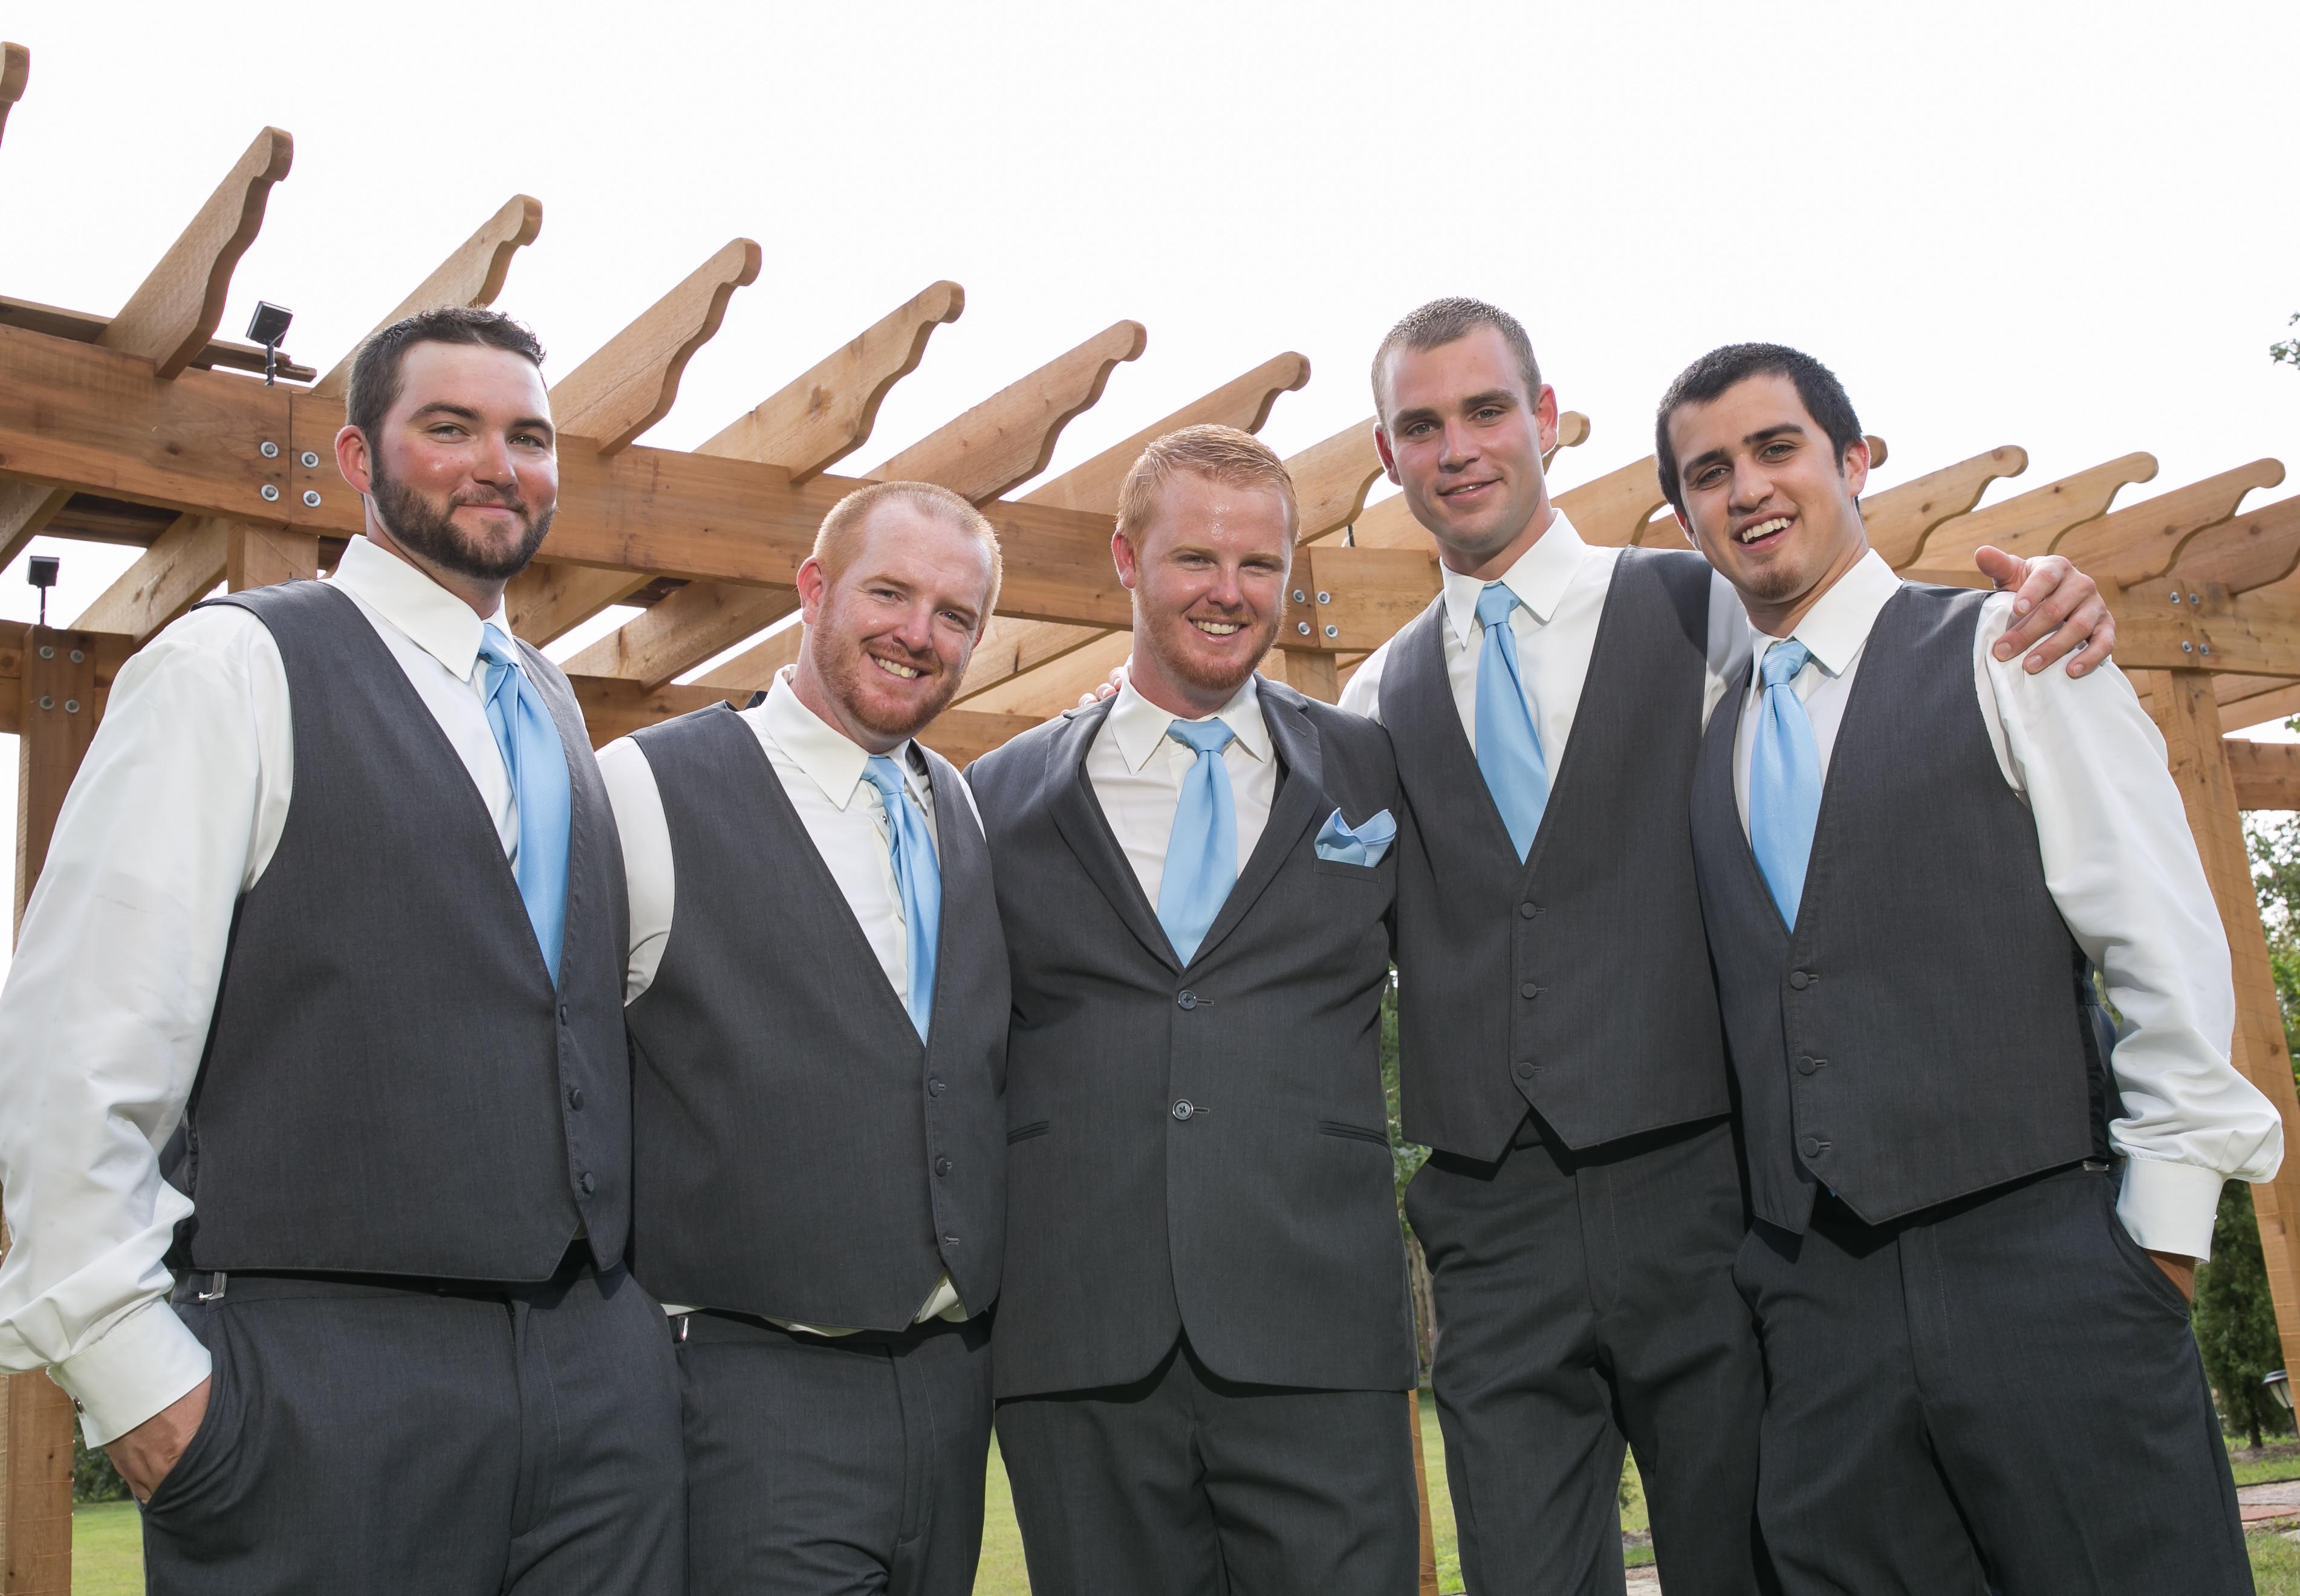 grooms men_hisandhersfoto